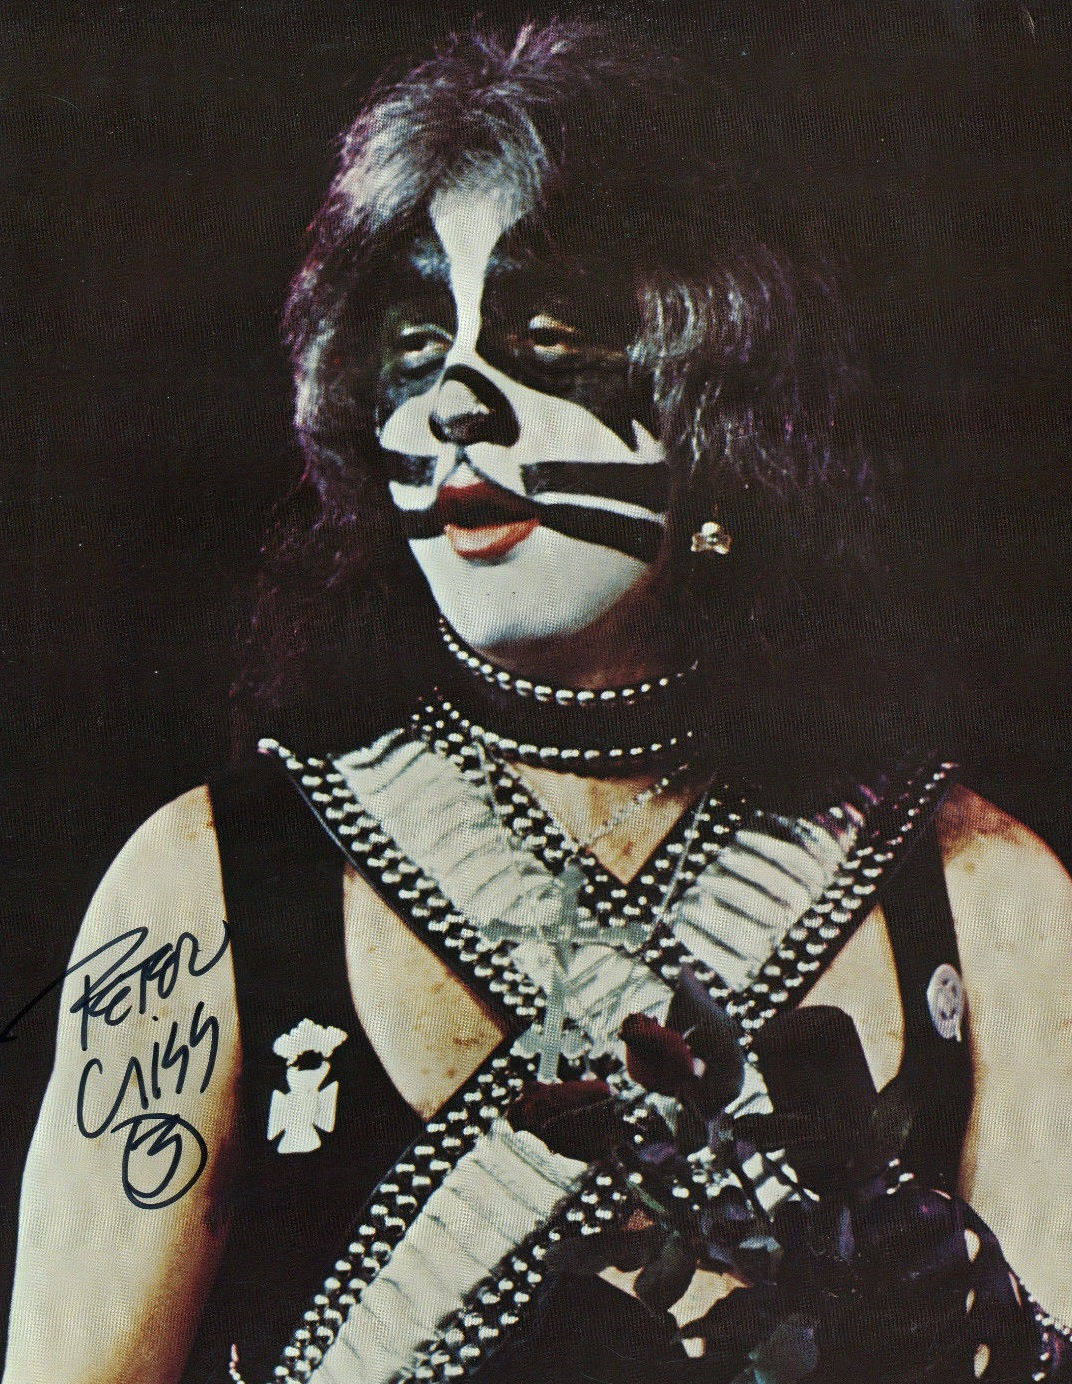 Peter Criss Cat